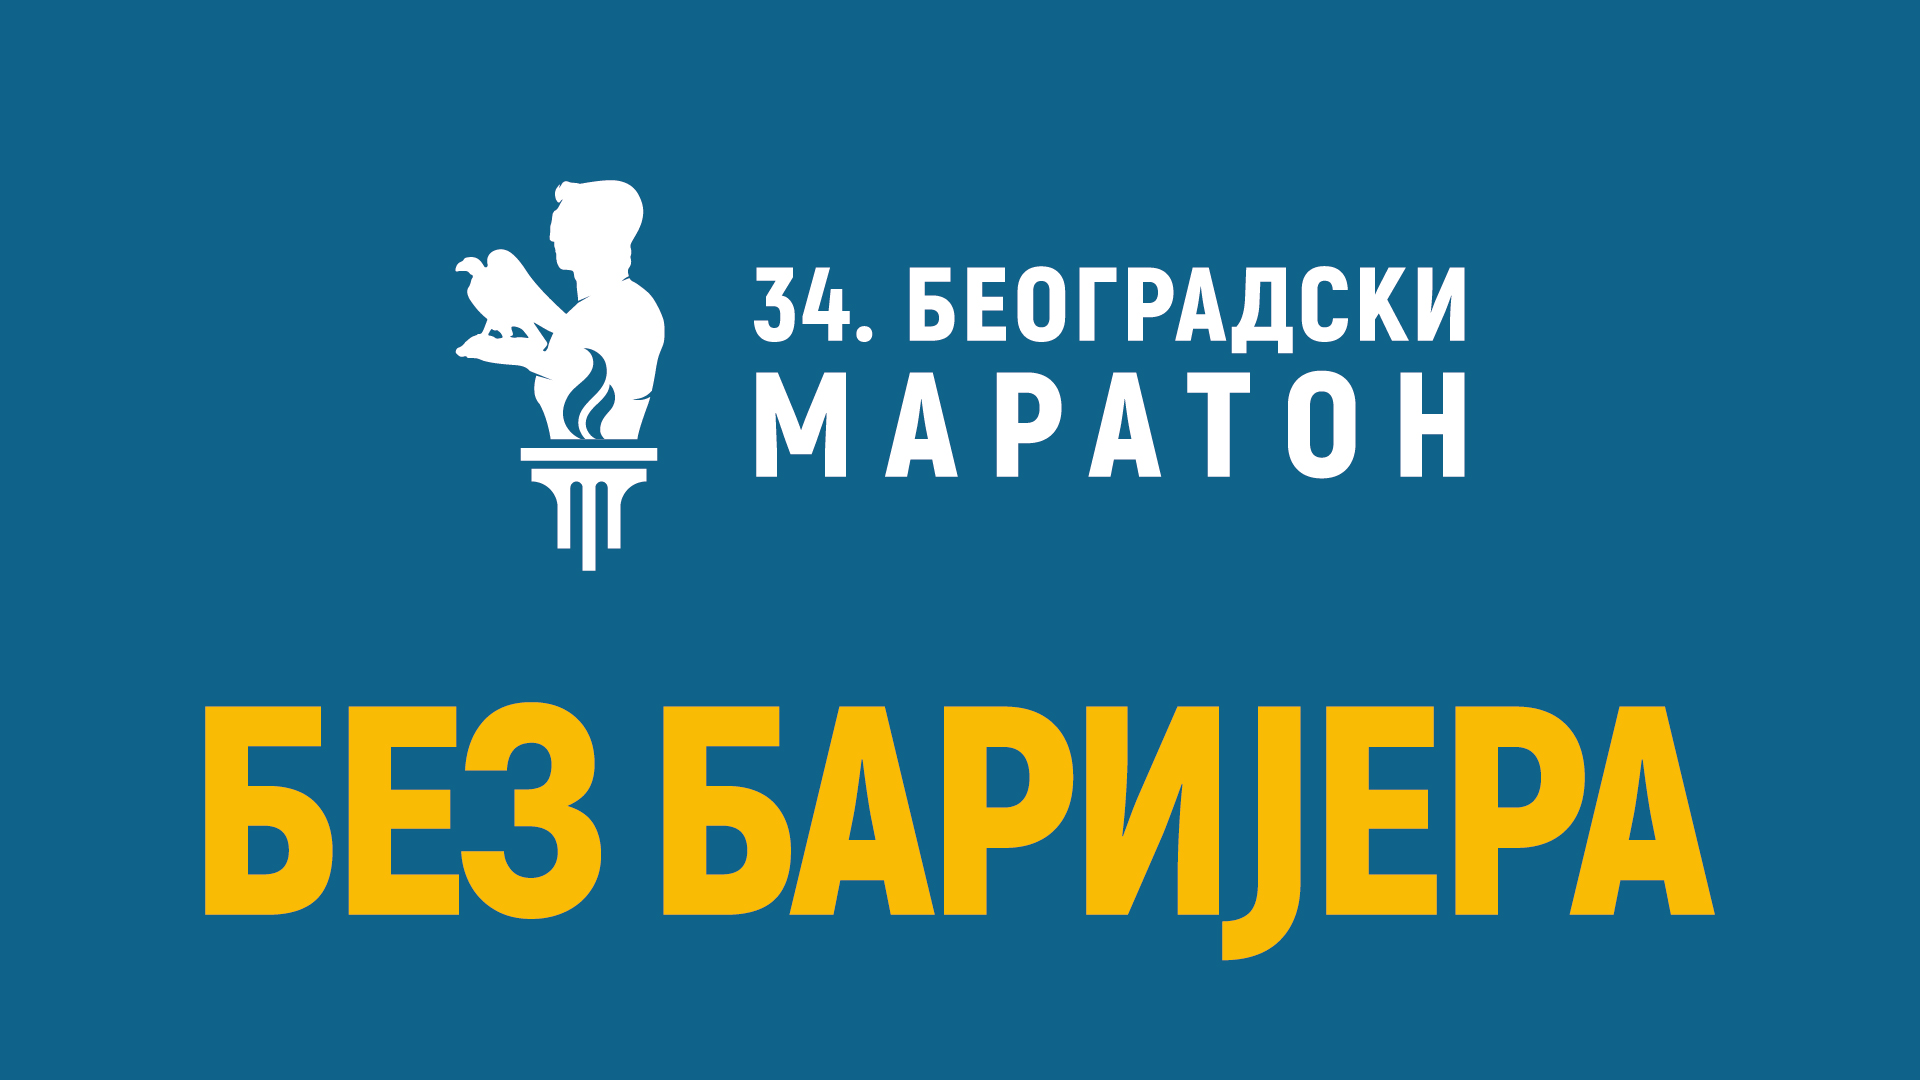 34. Beogradski maraton, Crvena zvezda i Partizan: Bez barijera